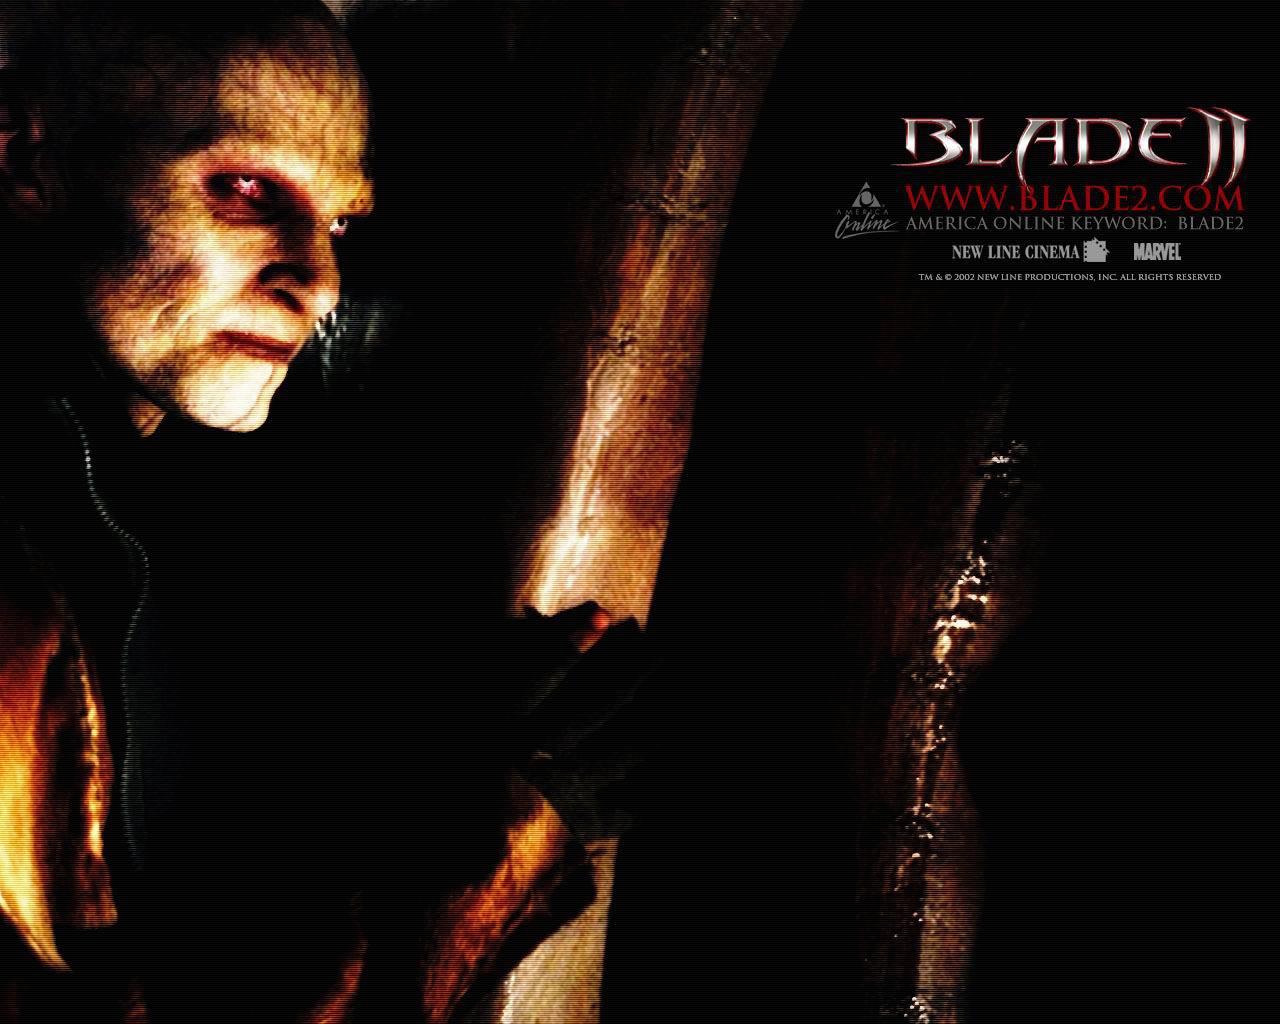 blade 1998 wallpaper - photo #23